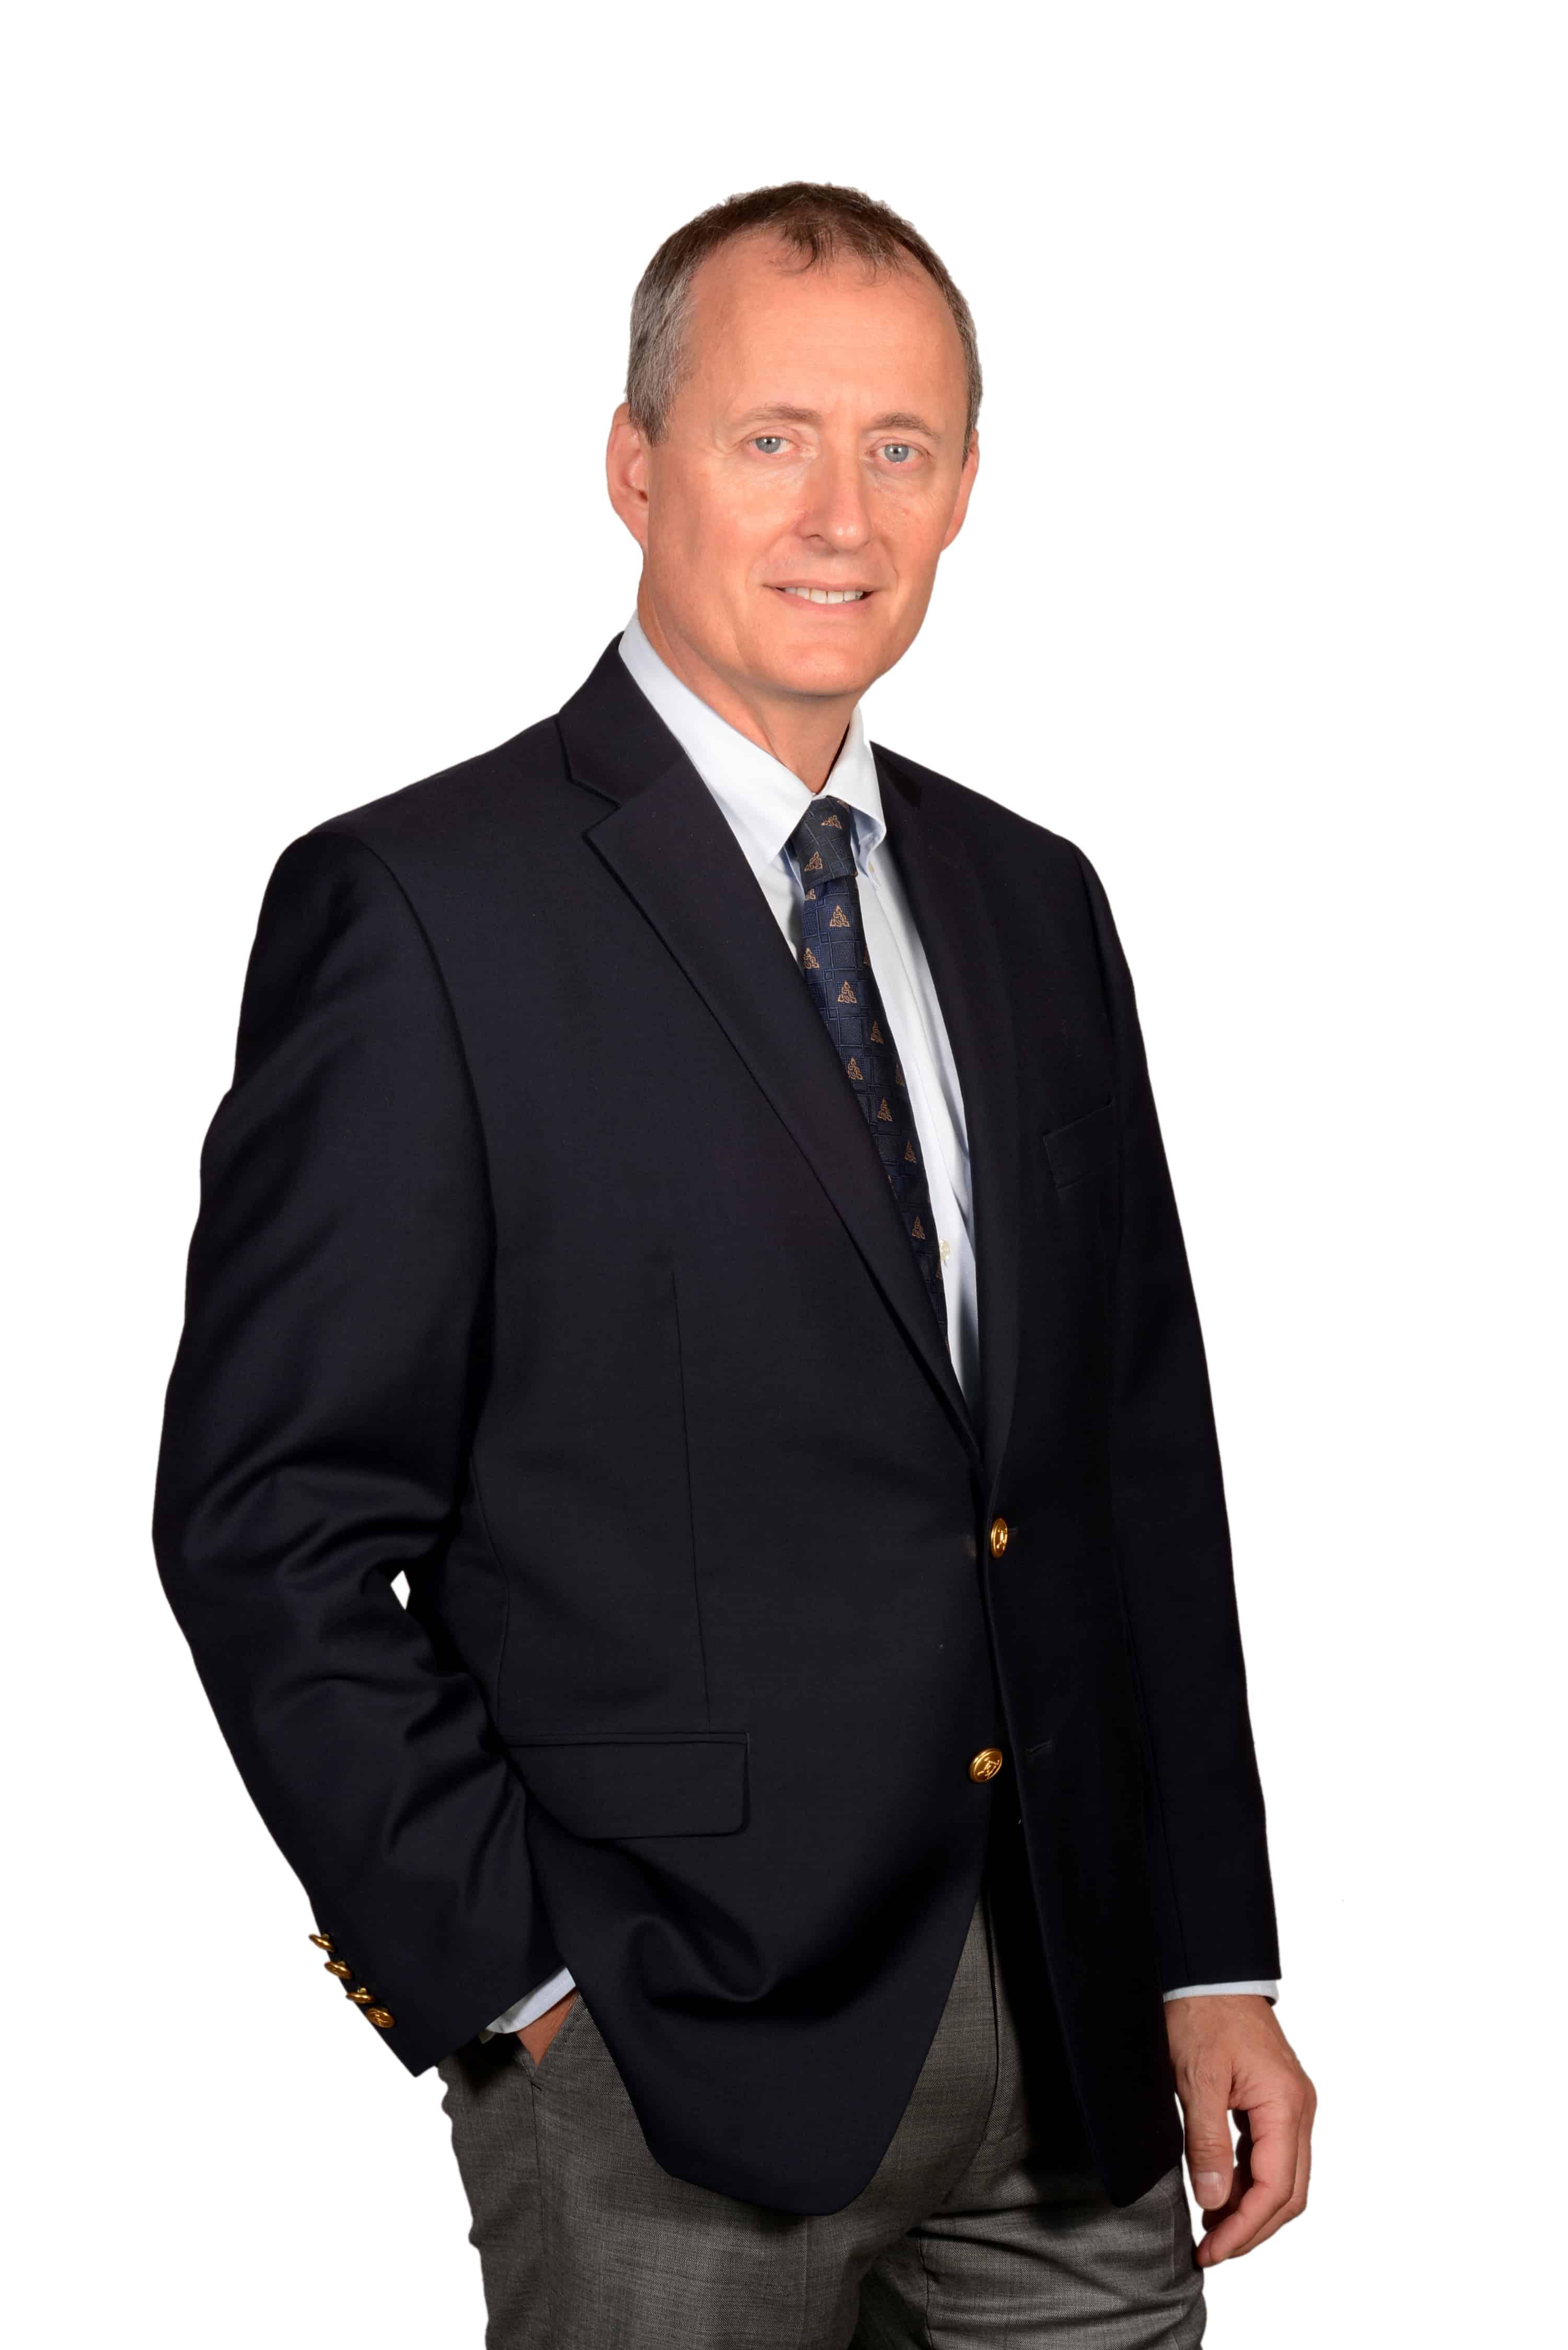 Dr. Michael Sean Dudeney